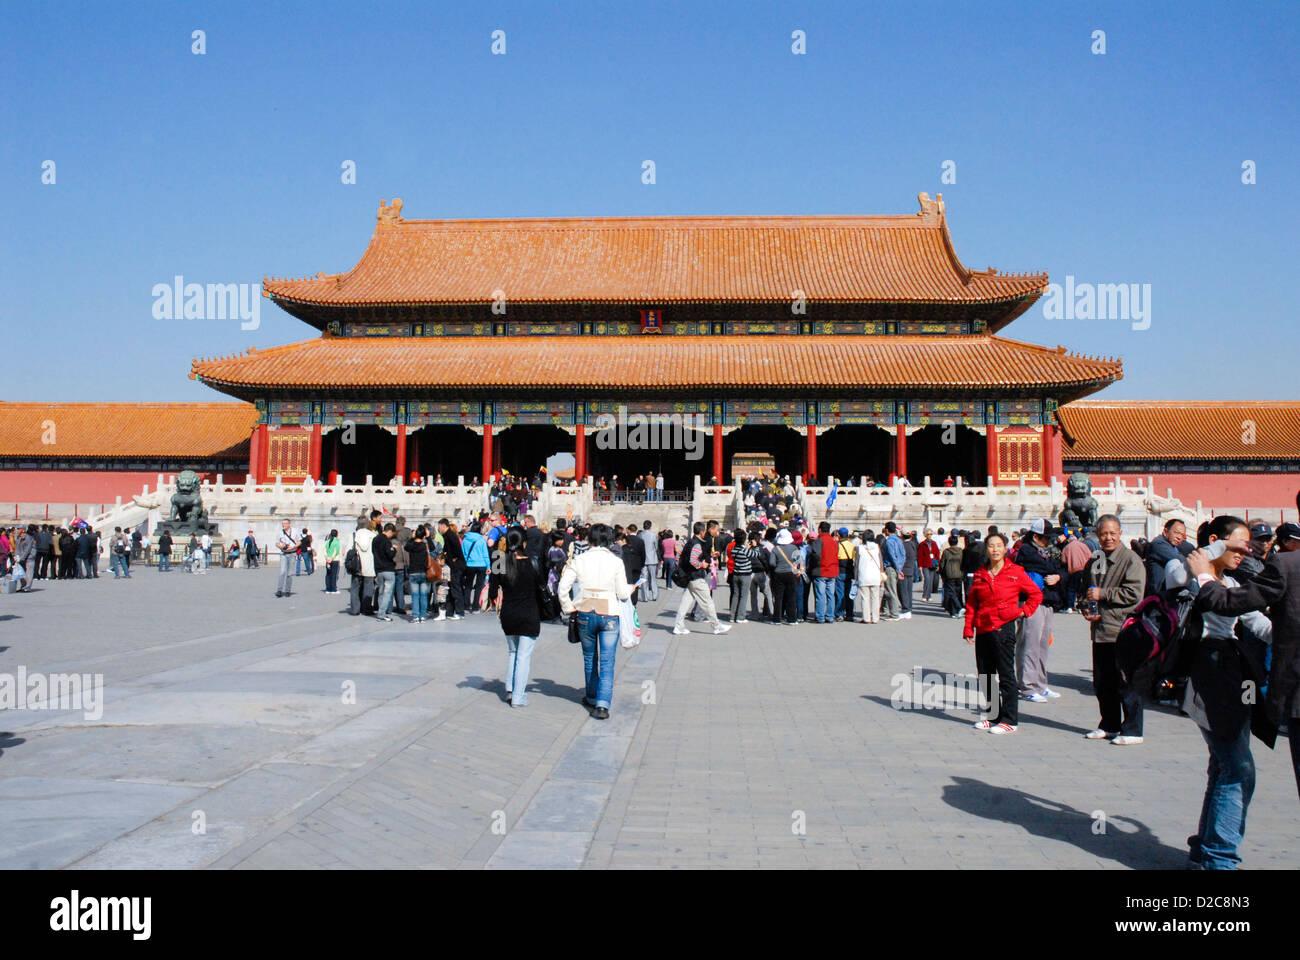 Porte de l'harmonie suprême, la Cité Interdite, Pékin, Chine Photo Stock